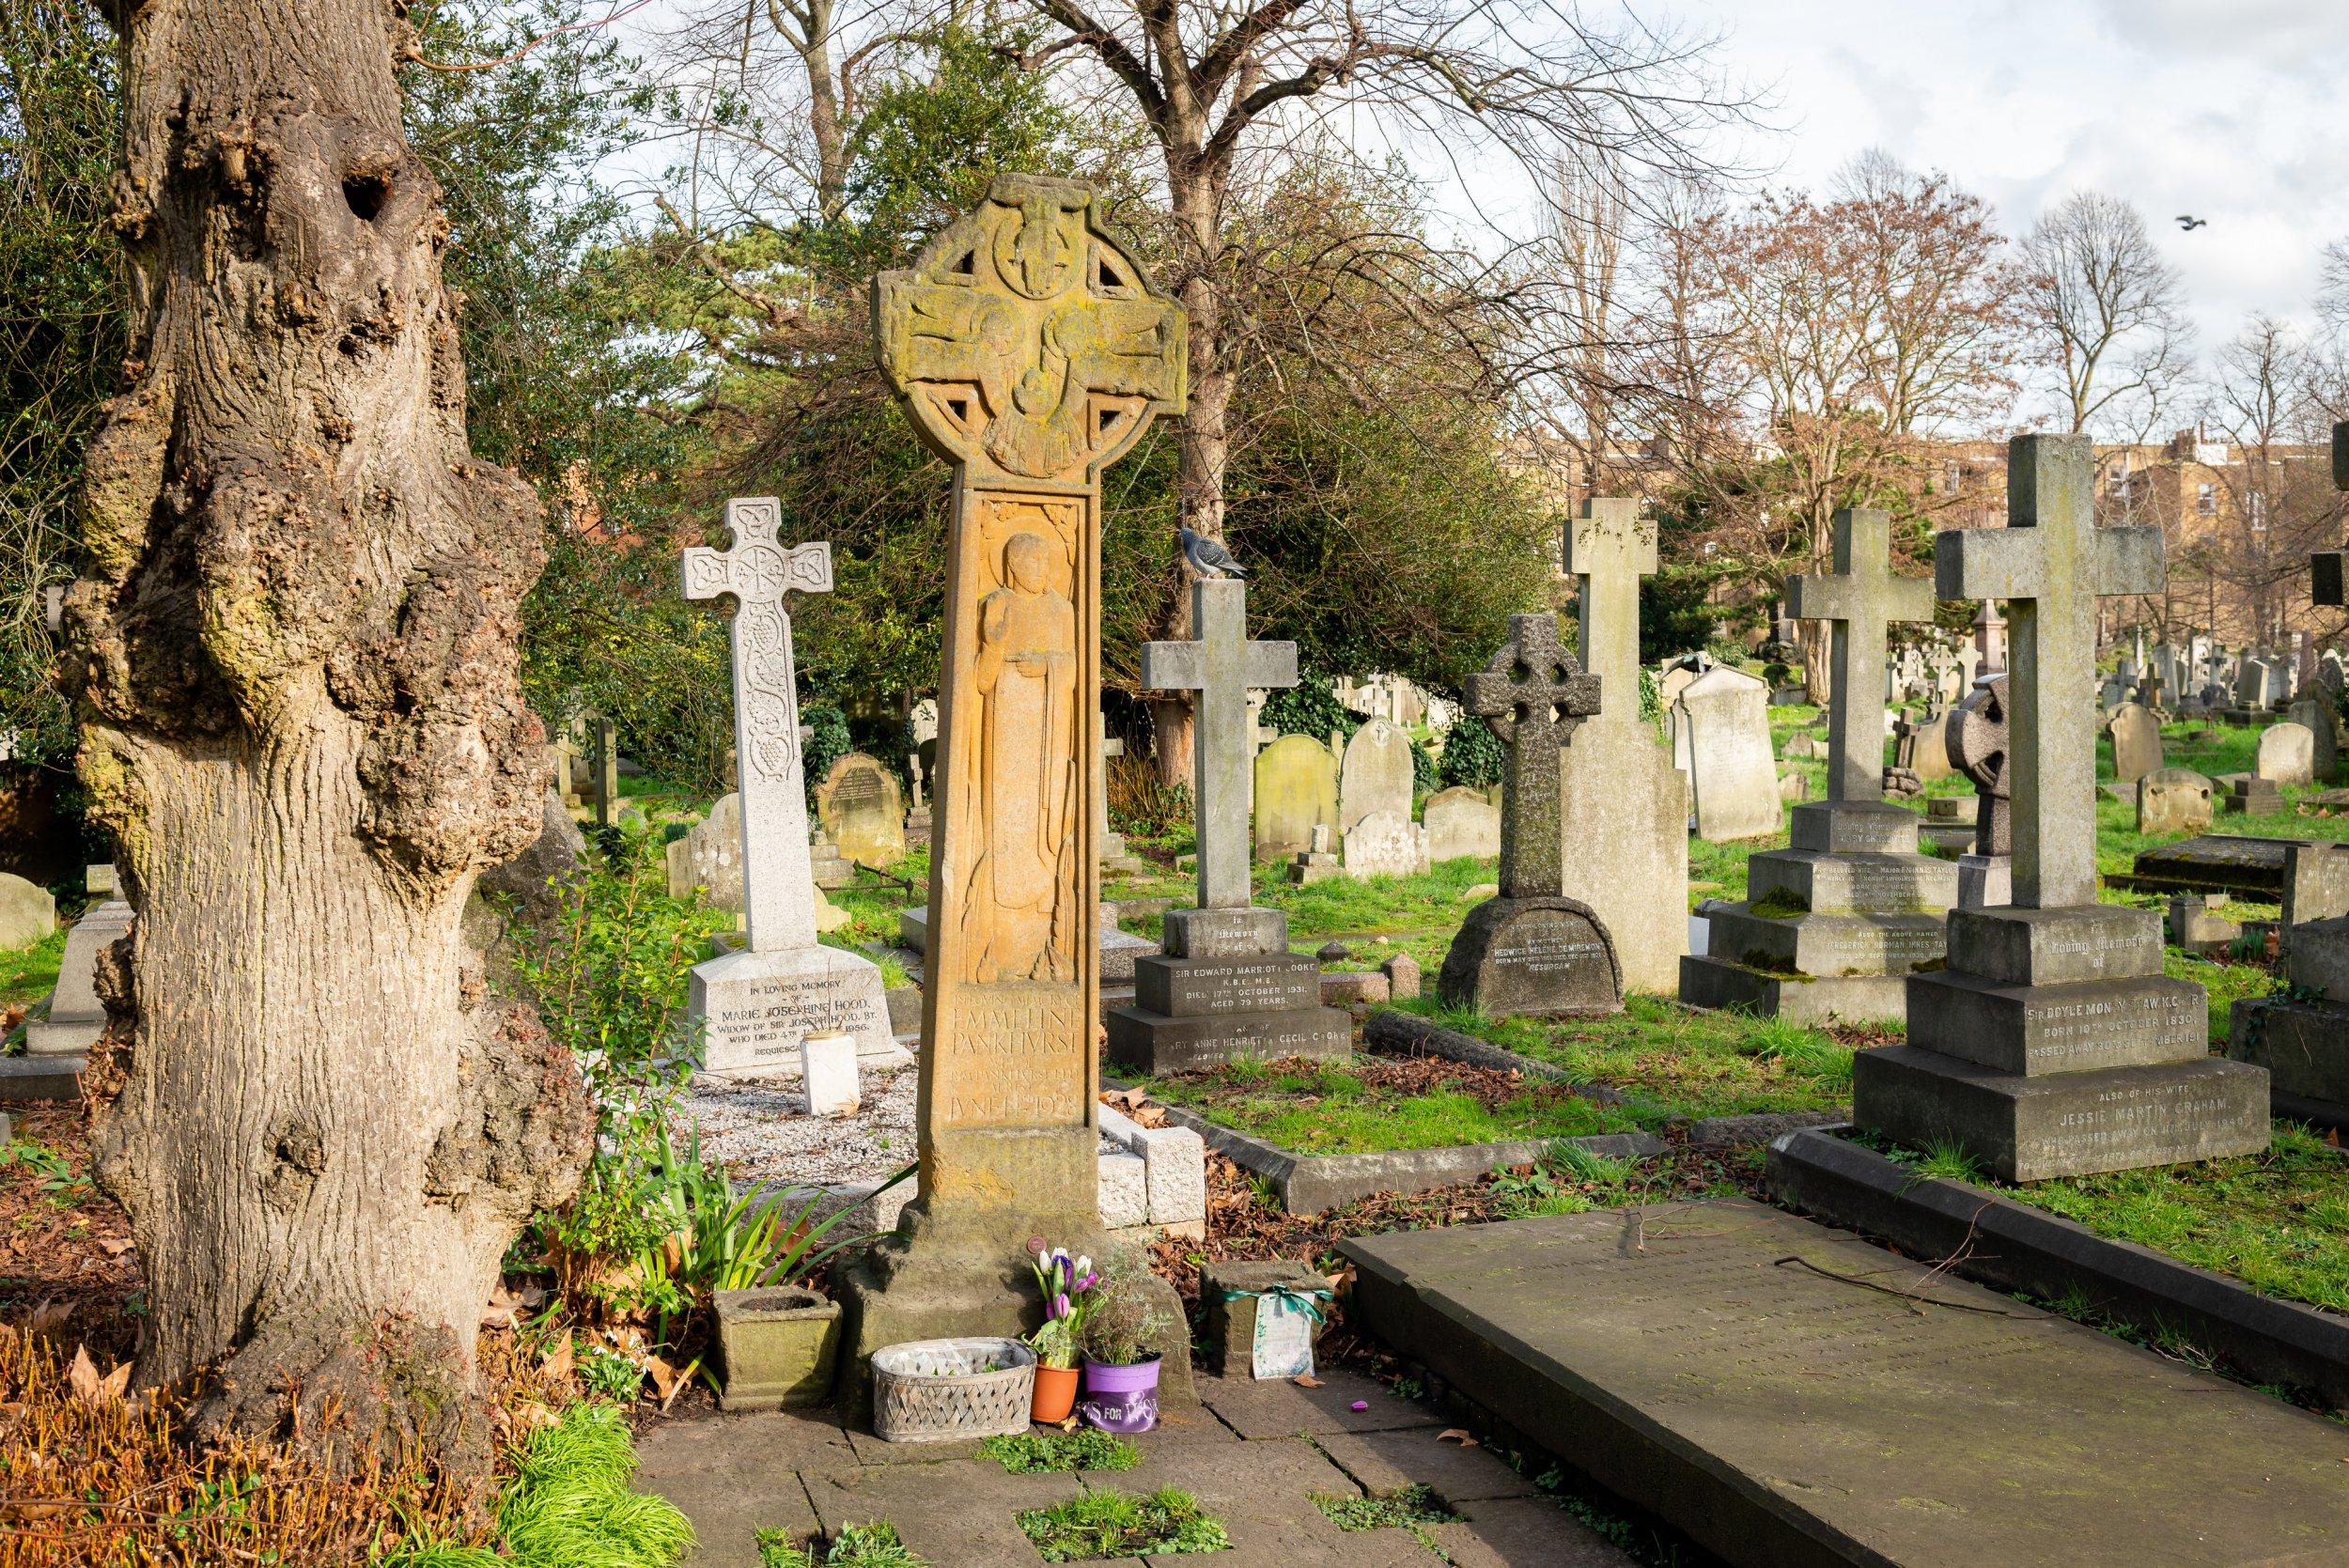 LGBT cemetery tour - Laura Abernethy